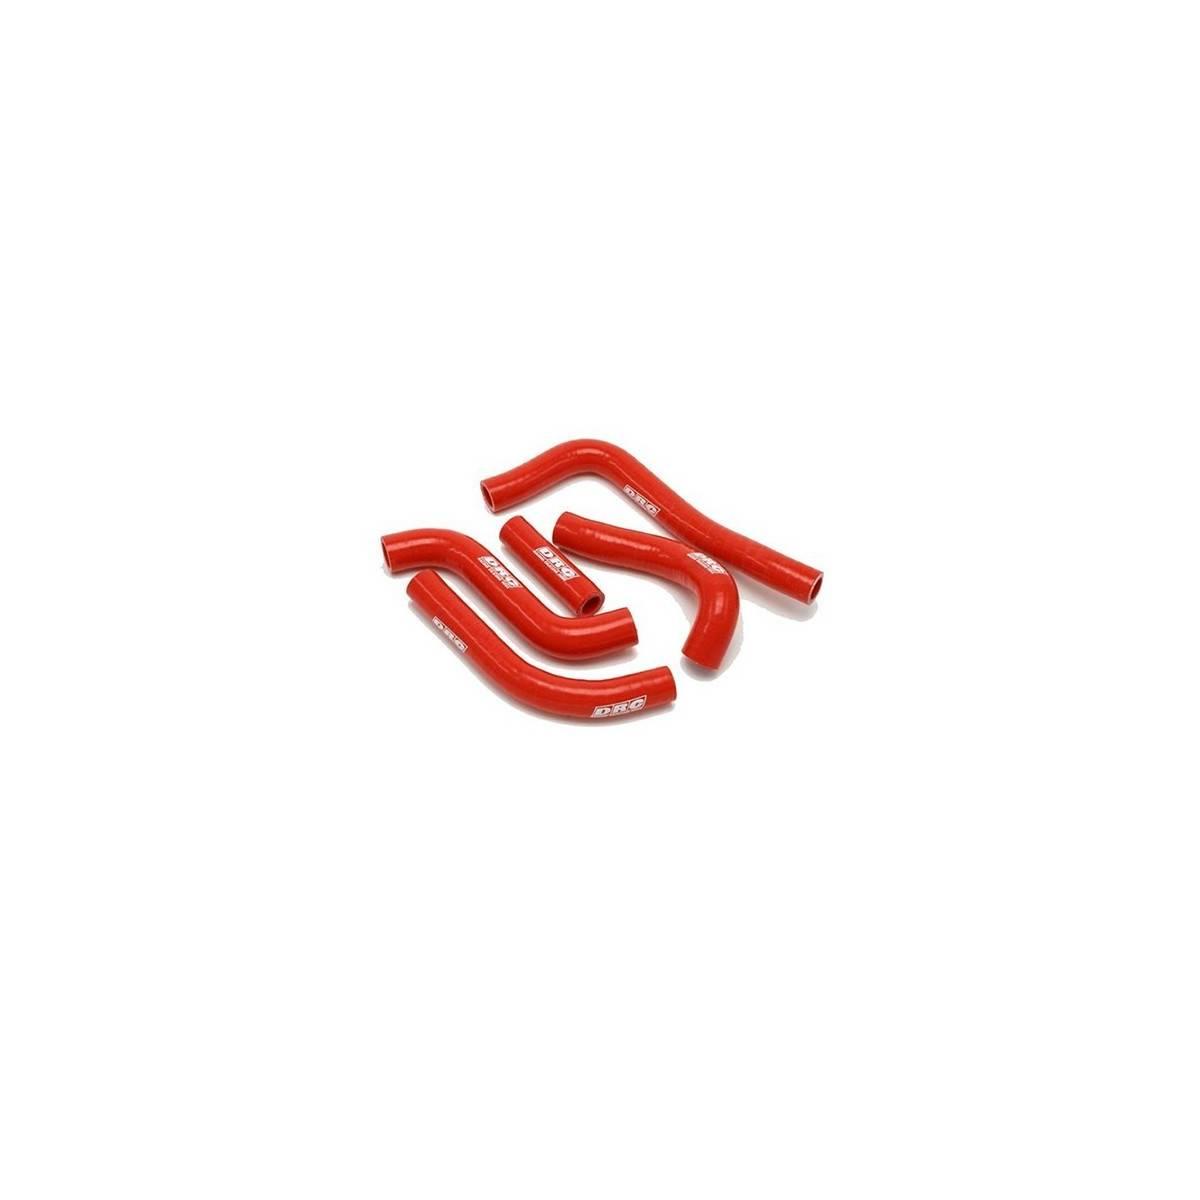 D47.01.183 - Kit Manguitos Radiador Honda Cr125R ´05 Rojo